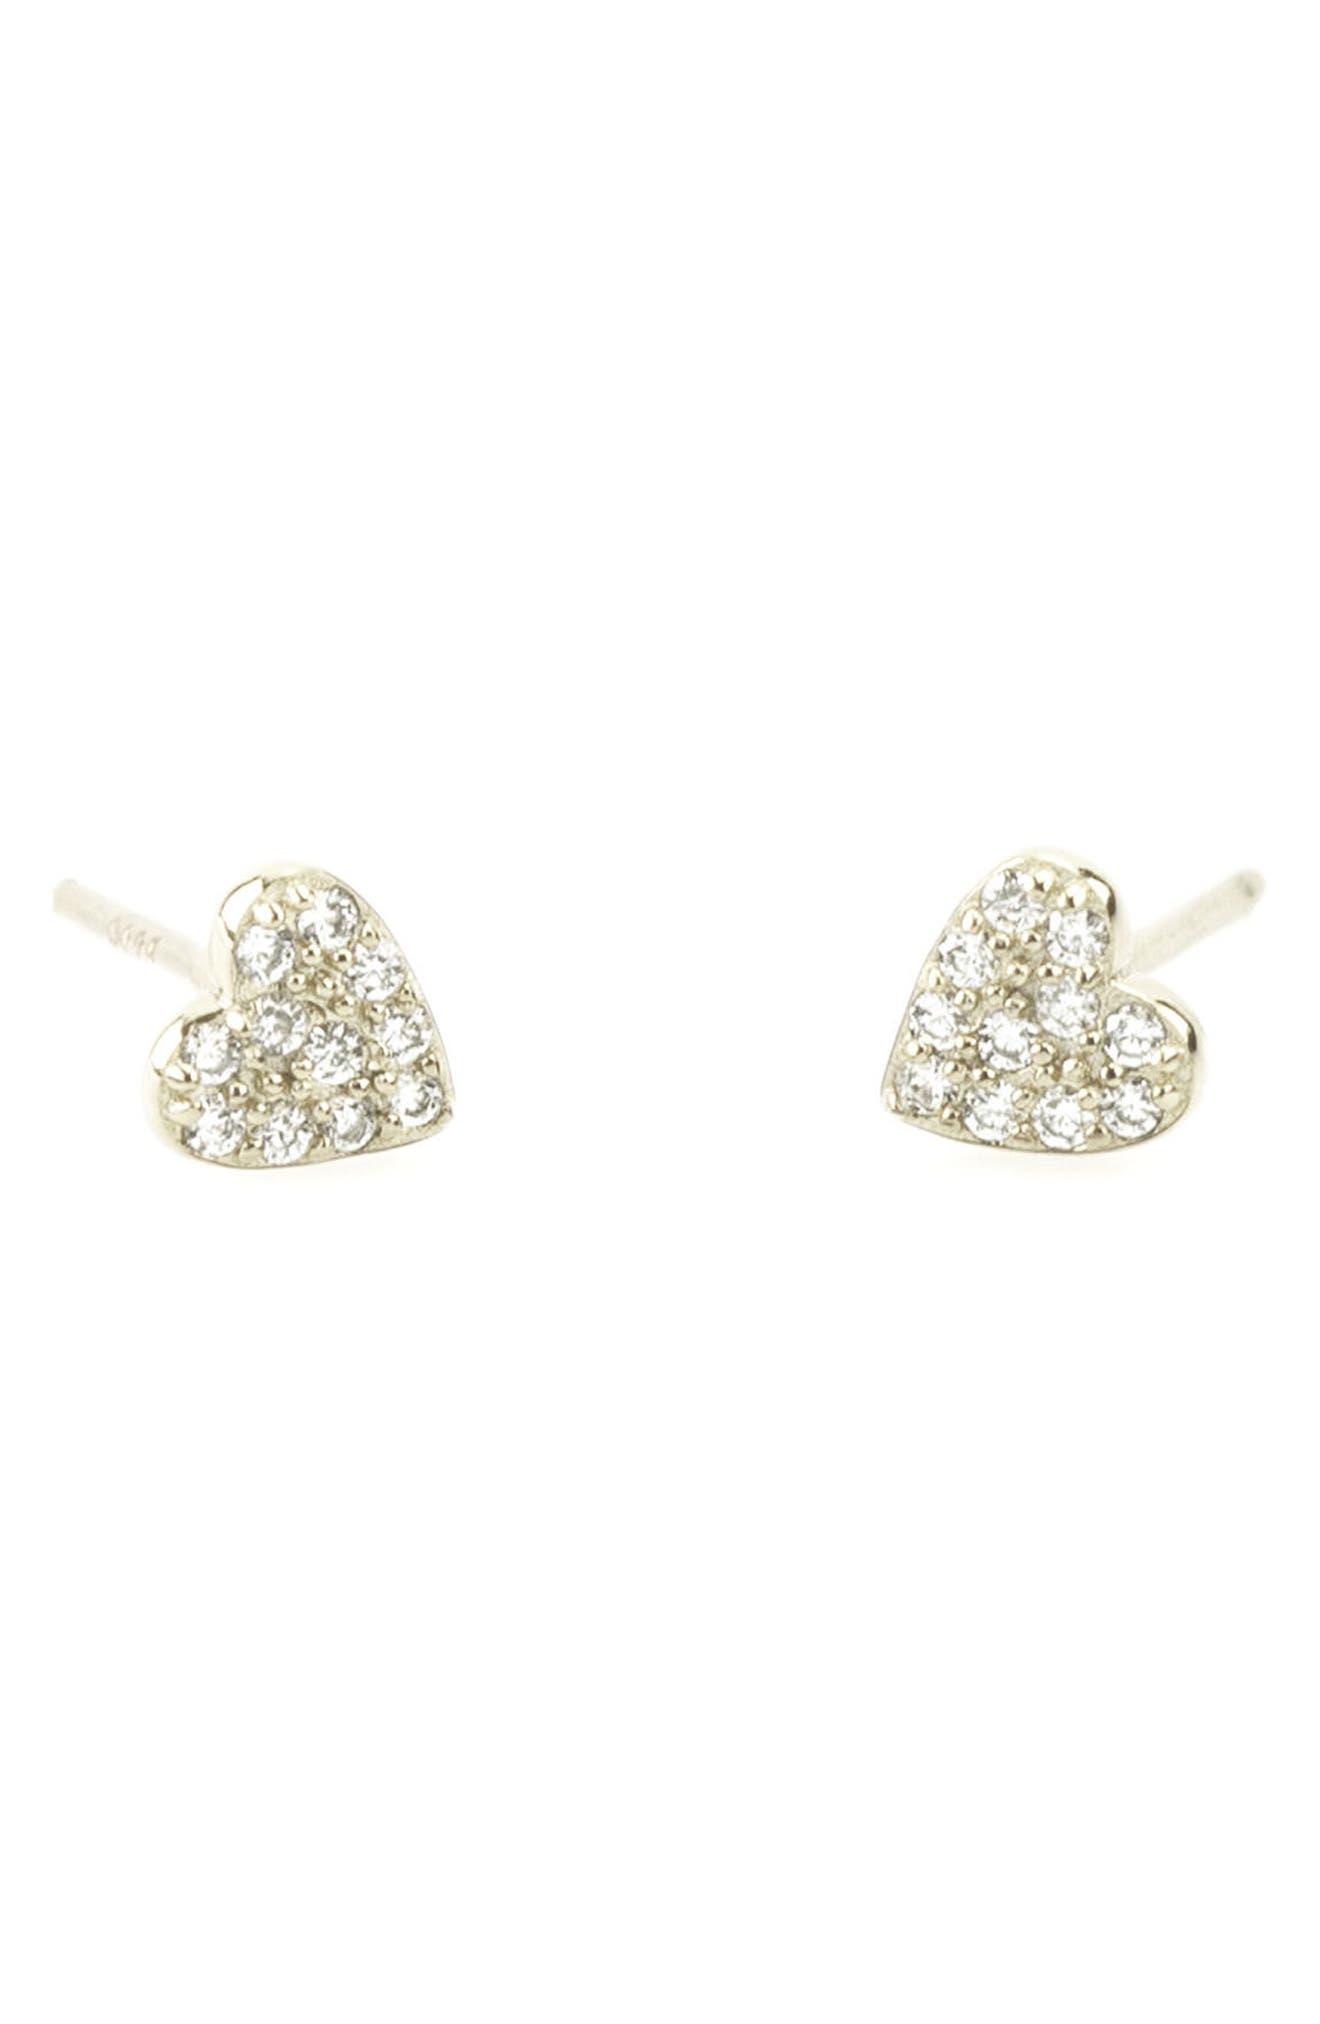 Pavé Heart Stud Earrings,                             Main thumbnail 1, color,                             Silver